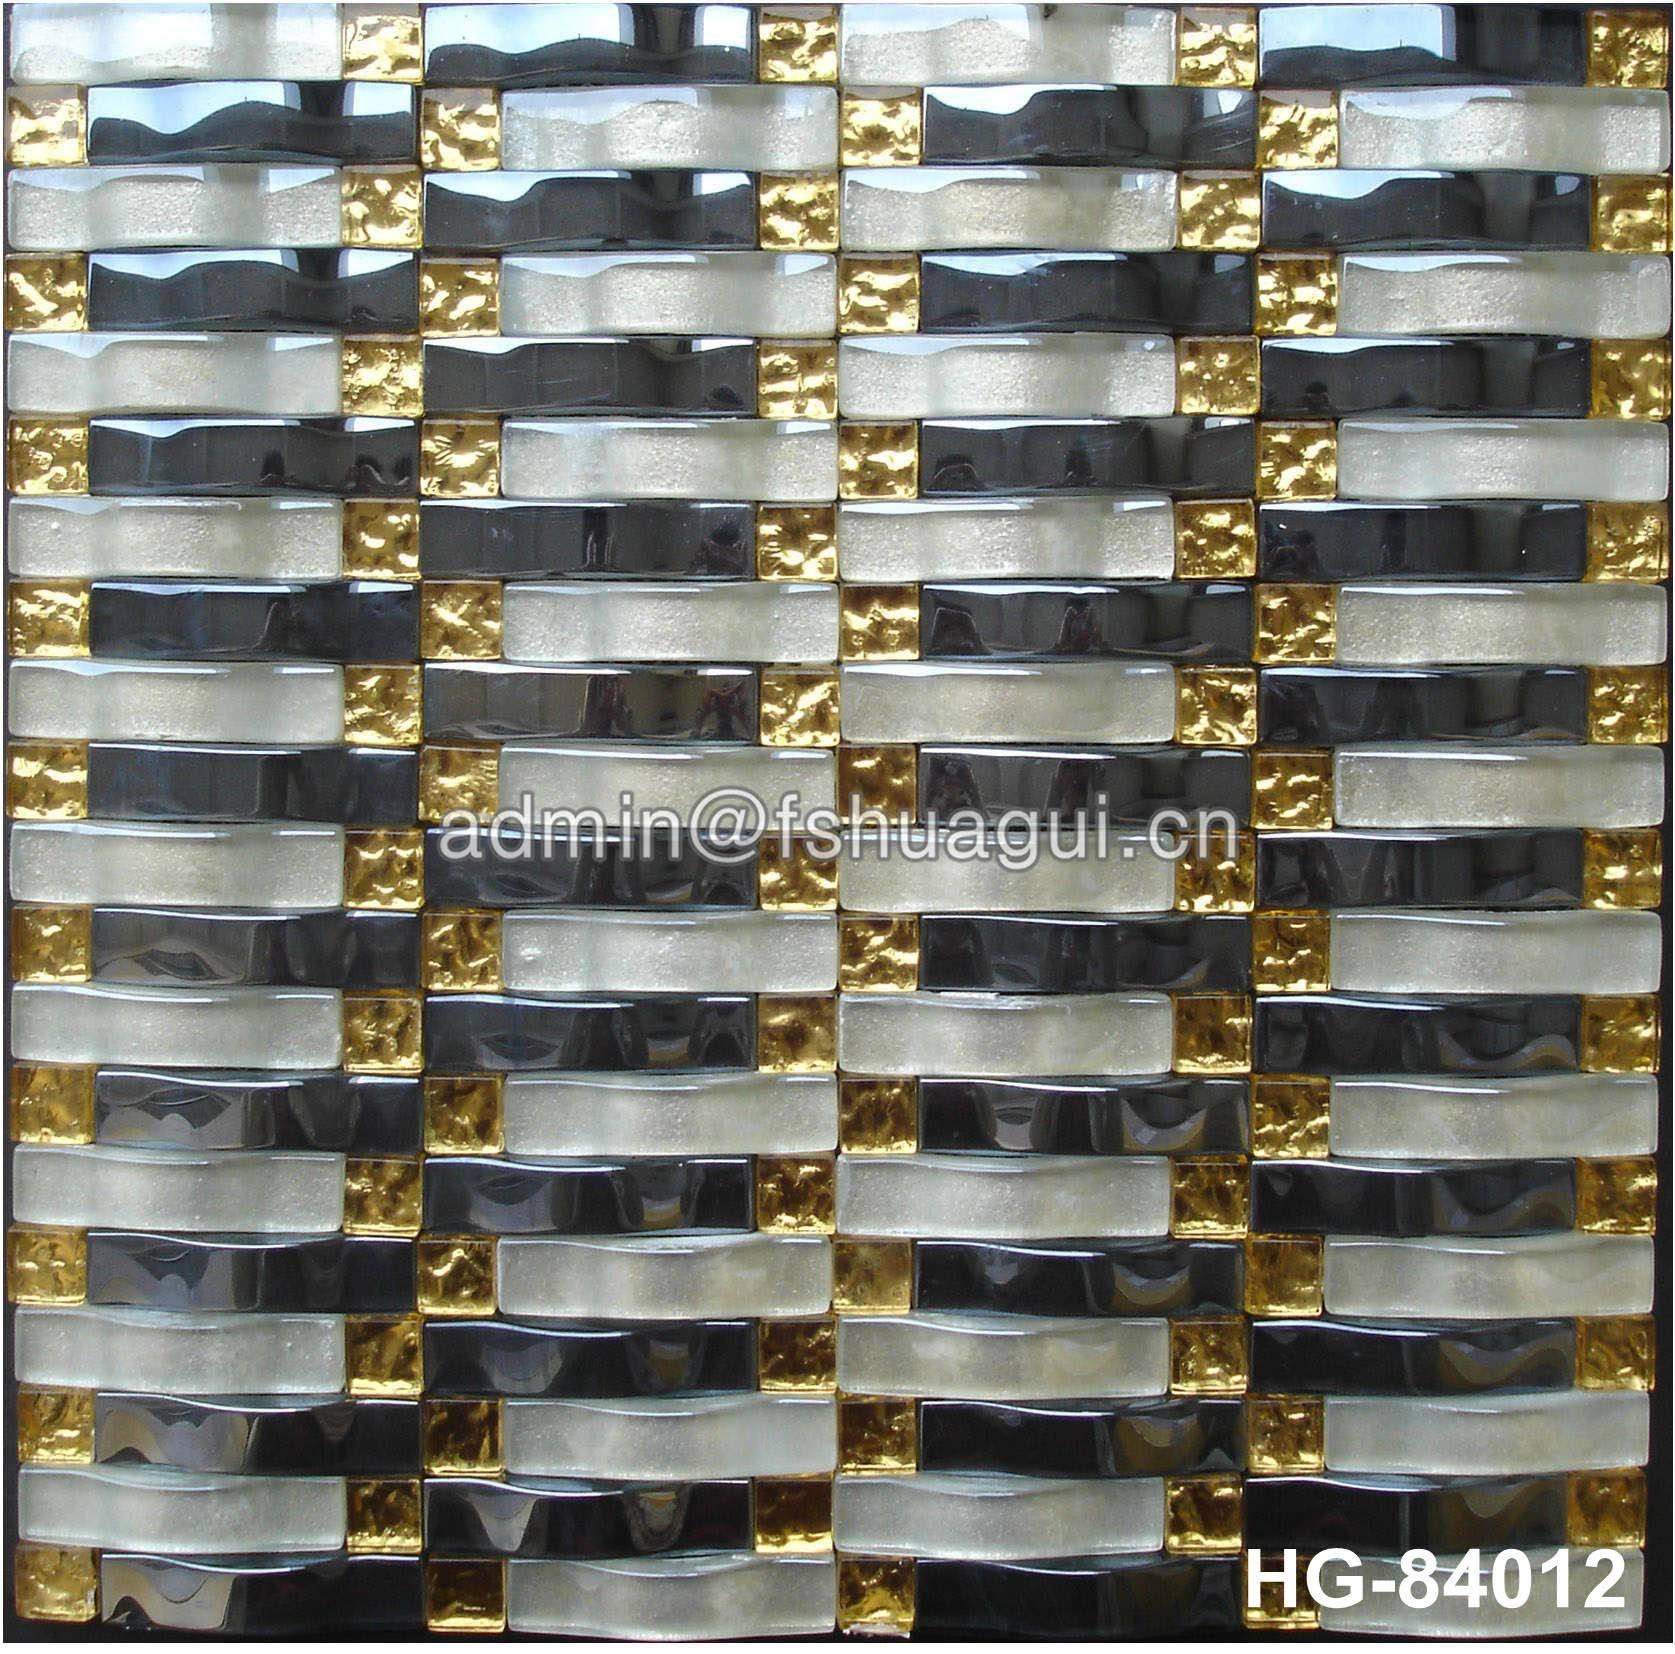 Huagui Glass mosaic tile HG-84012 GLASS MOSAIC TILE image43